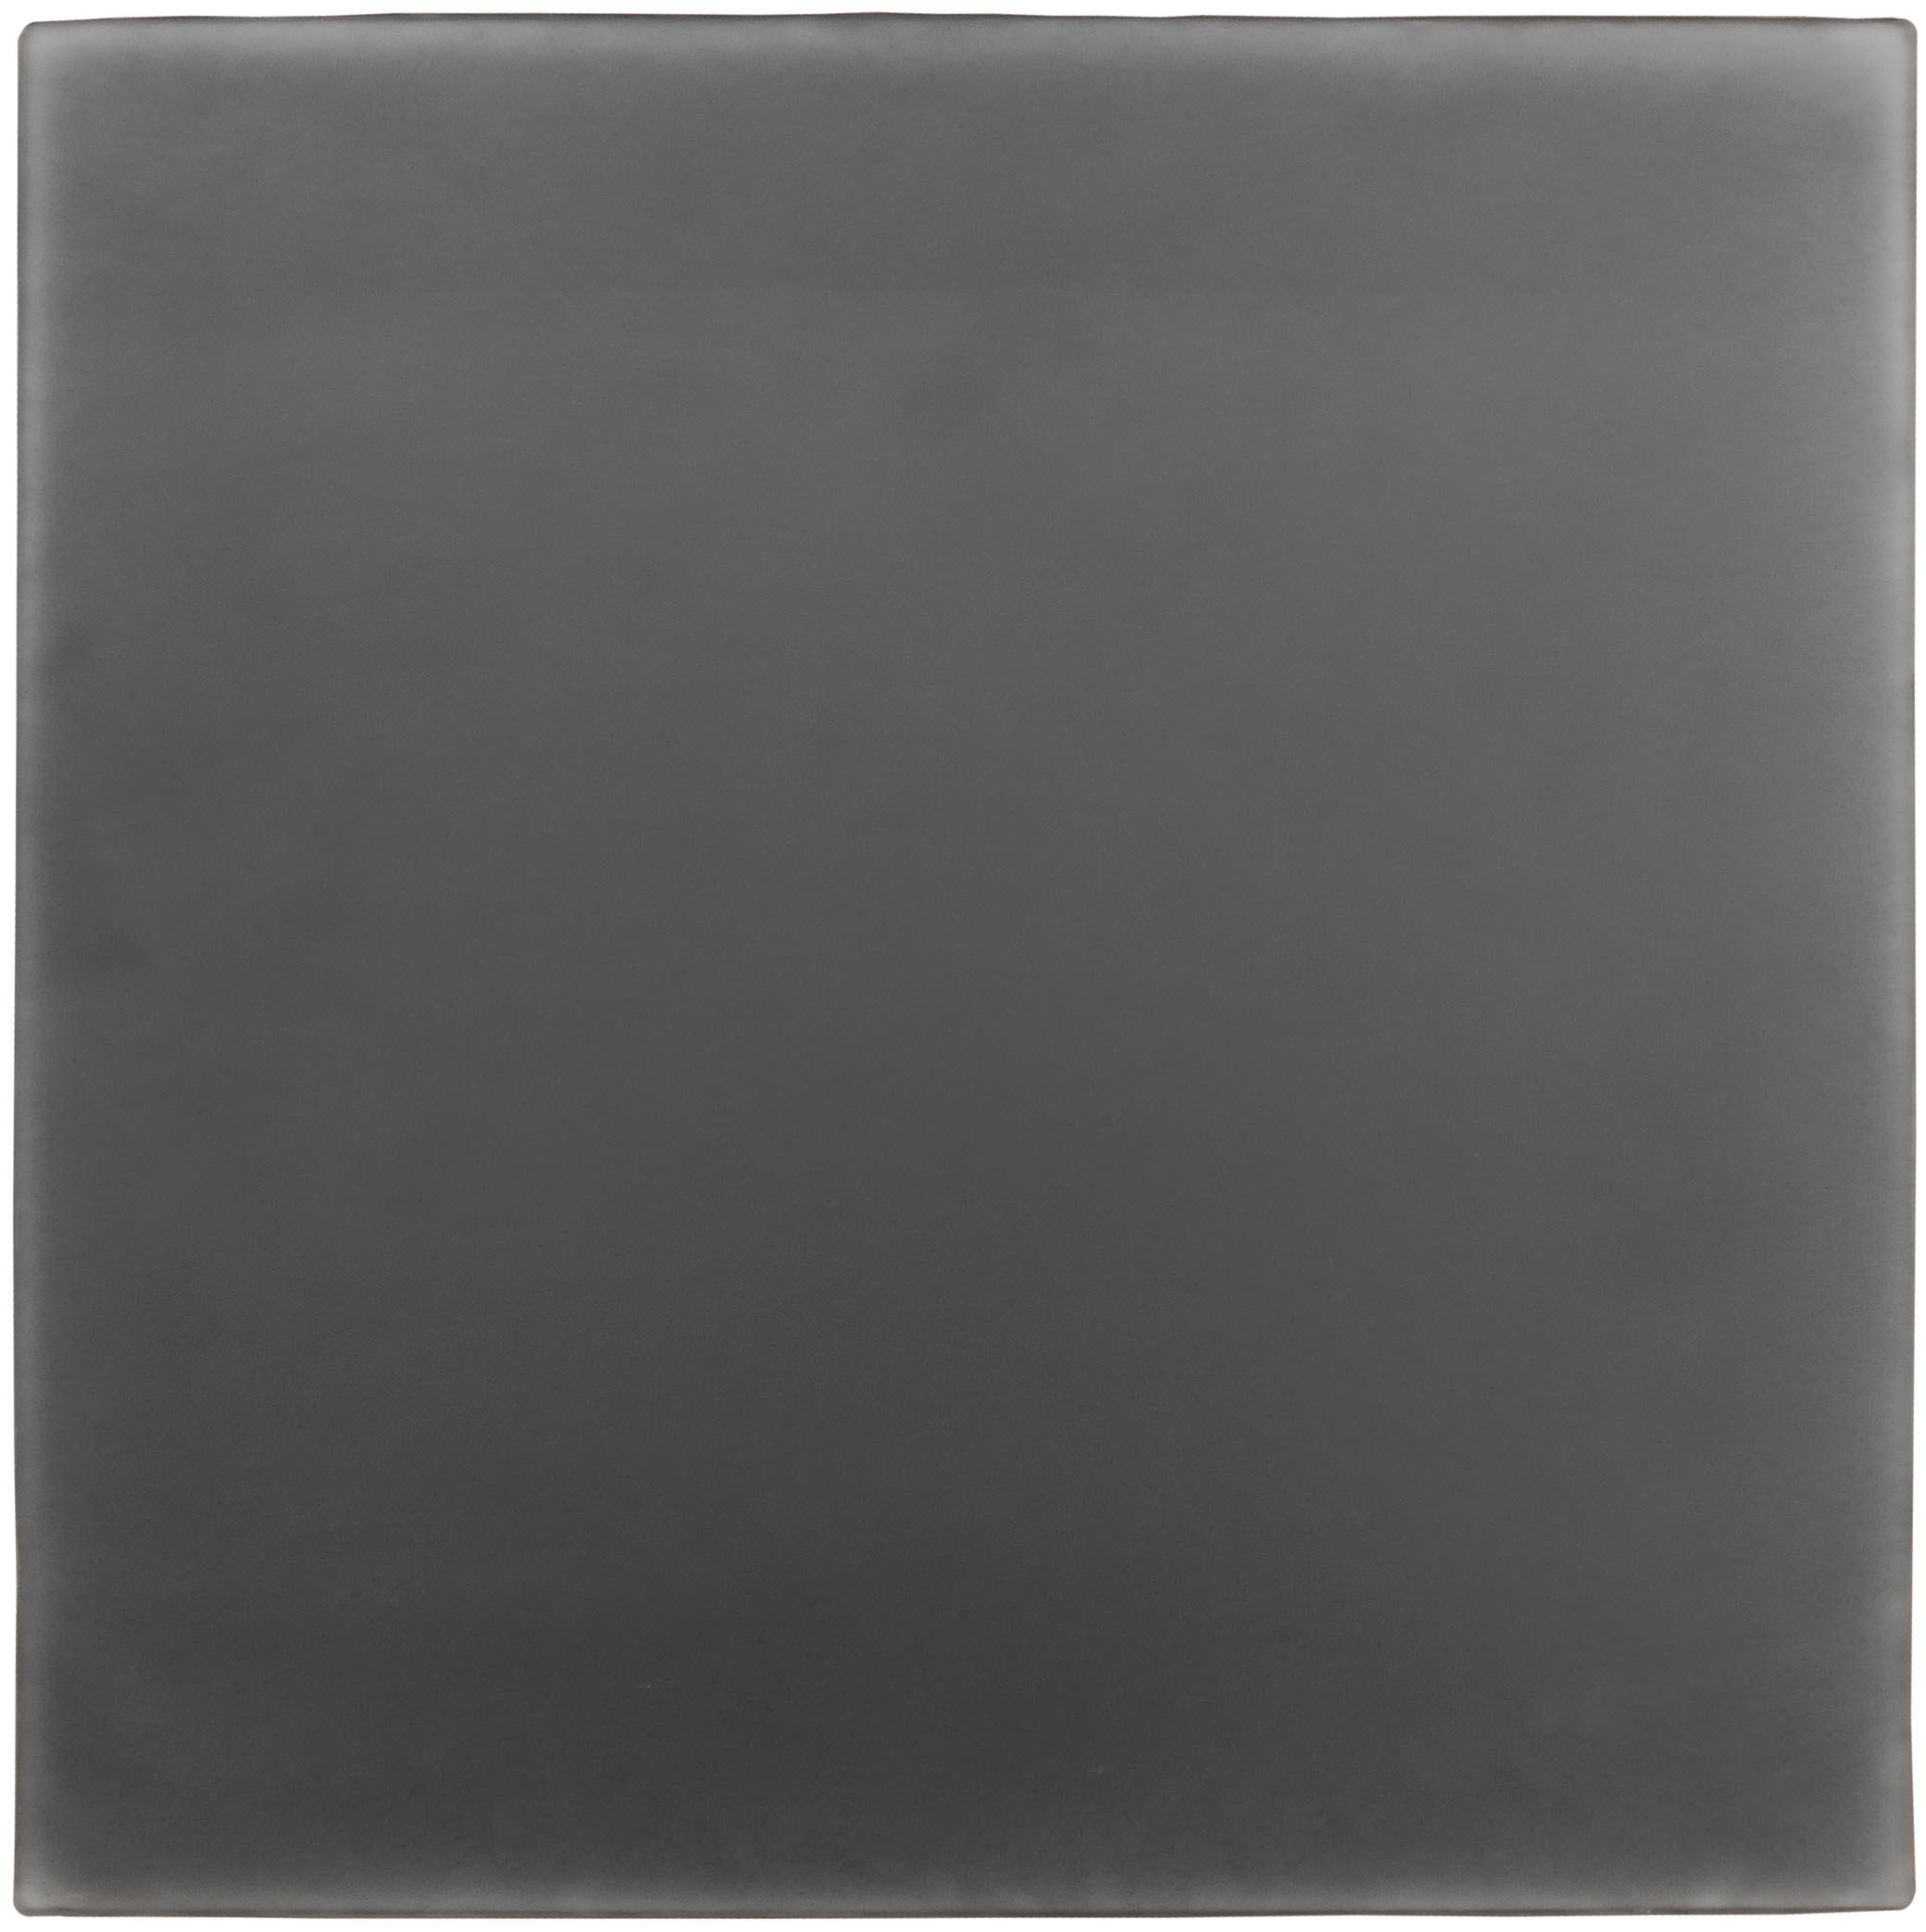 "UNTITLED #84, BLK Resin on mirrored plexiglass 16 x 16"" 1995  INQUIRE"